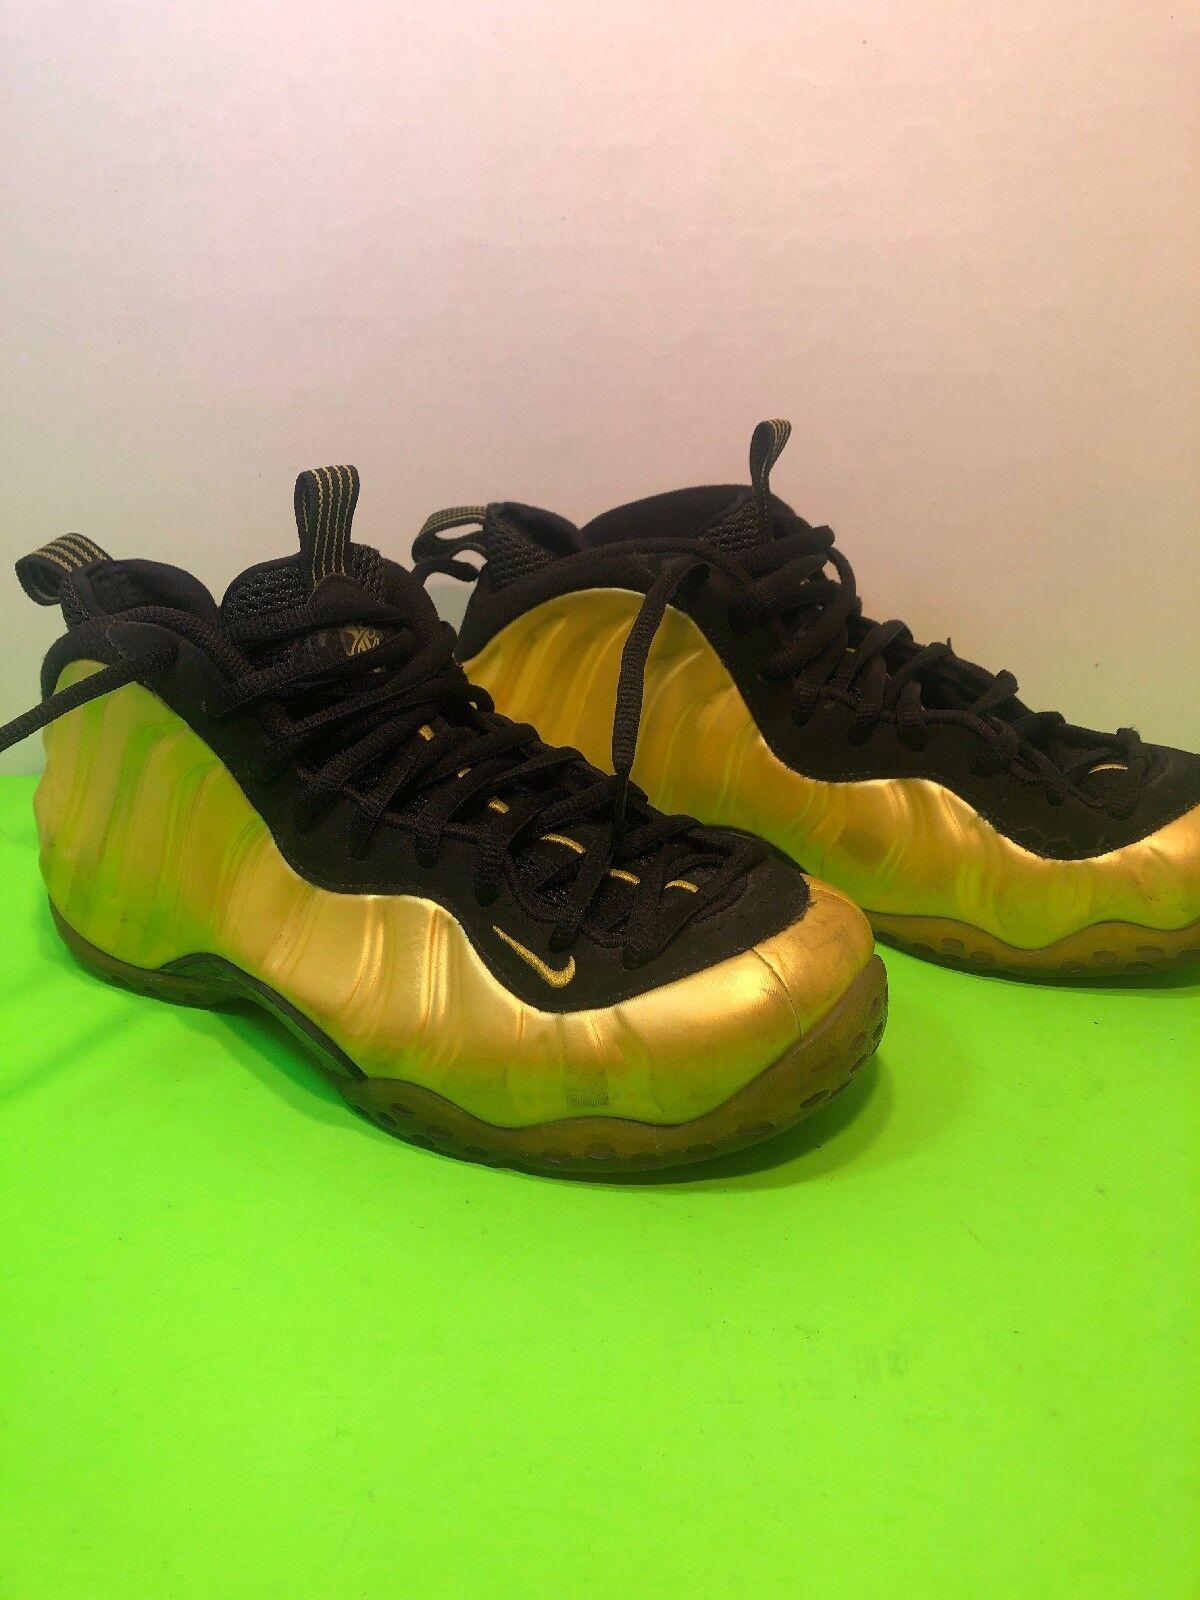 Nike Foamposite One Electrolime Yellow Black 314996-330 Men's Size 8.5